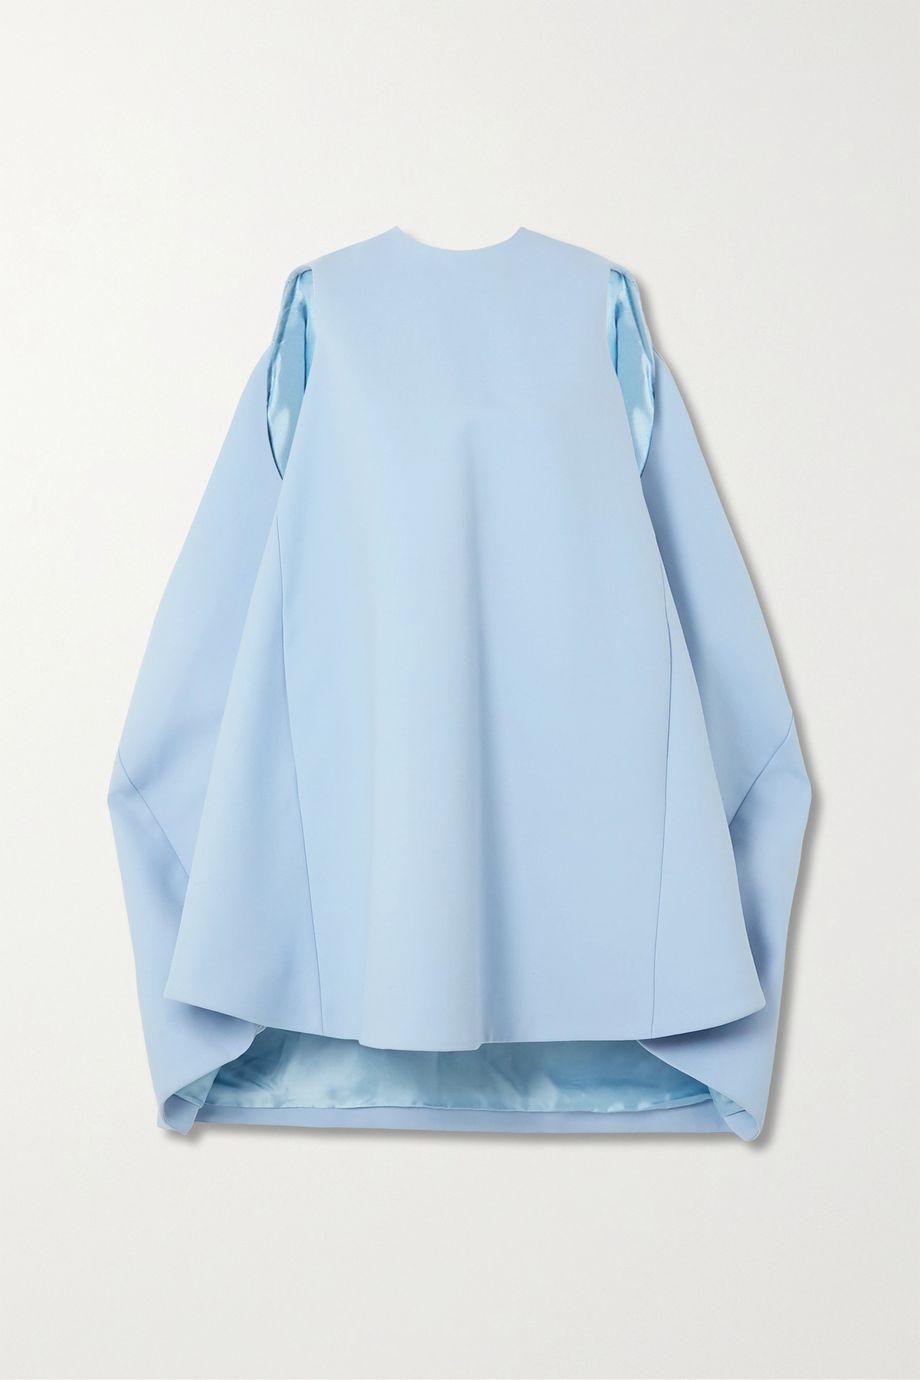 Nina Ricci Mini-robe en laine mélangée à drapés